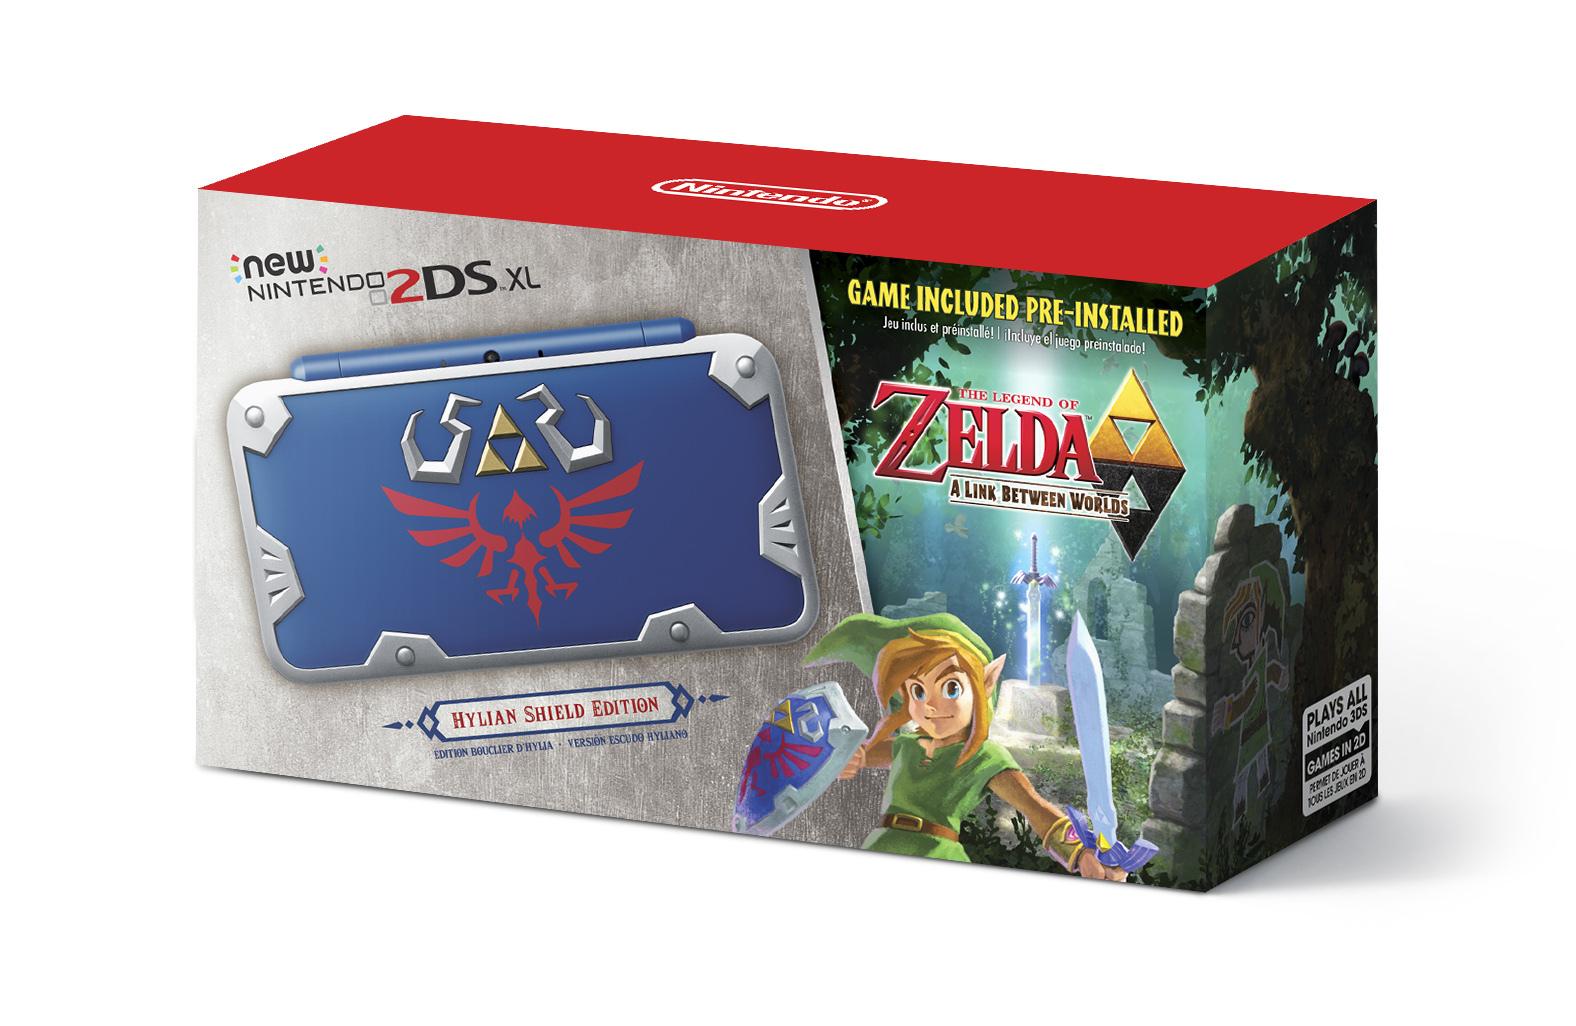 Nintendo News Legendary New Nintendo 2ds Xl System Coming